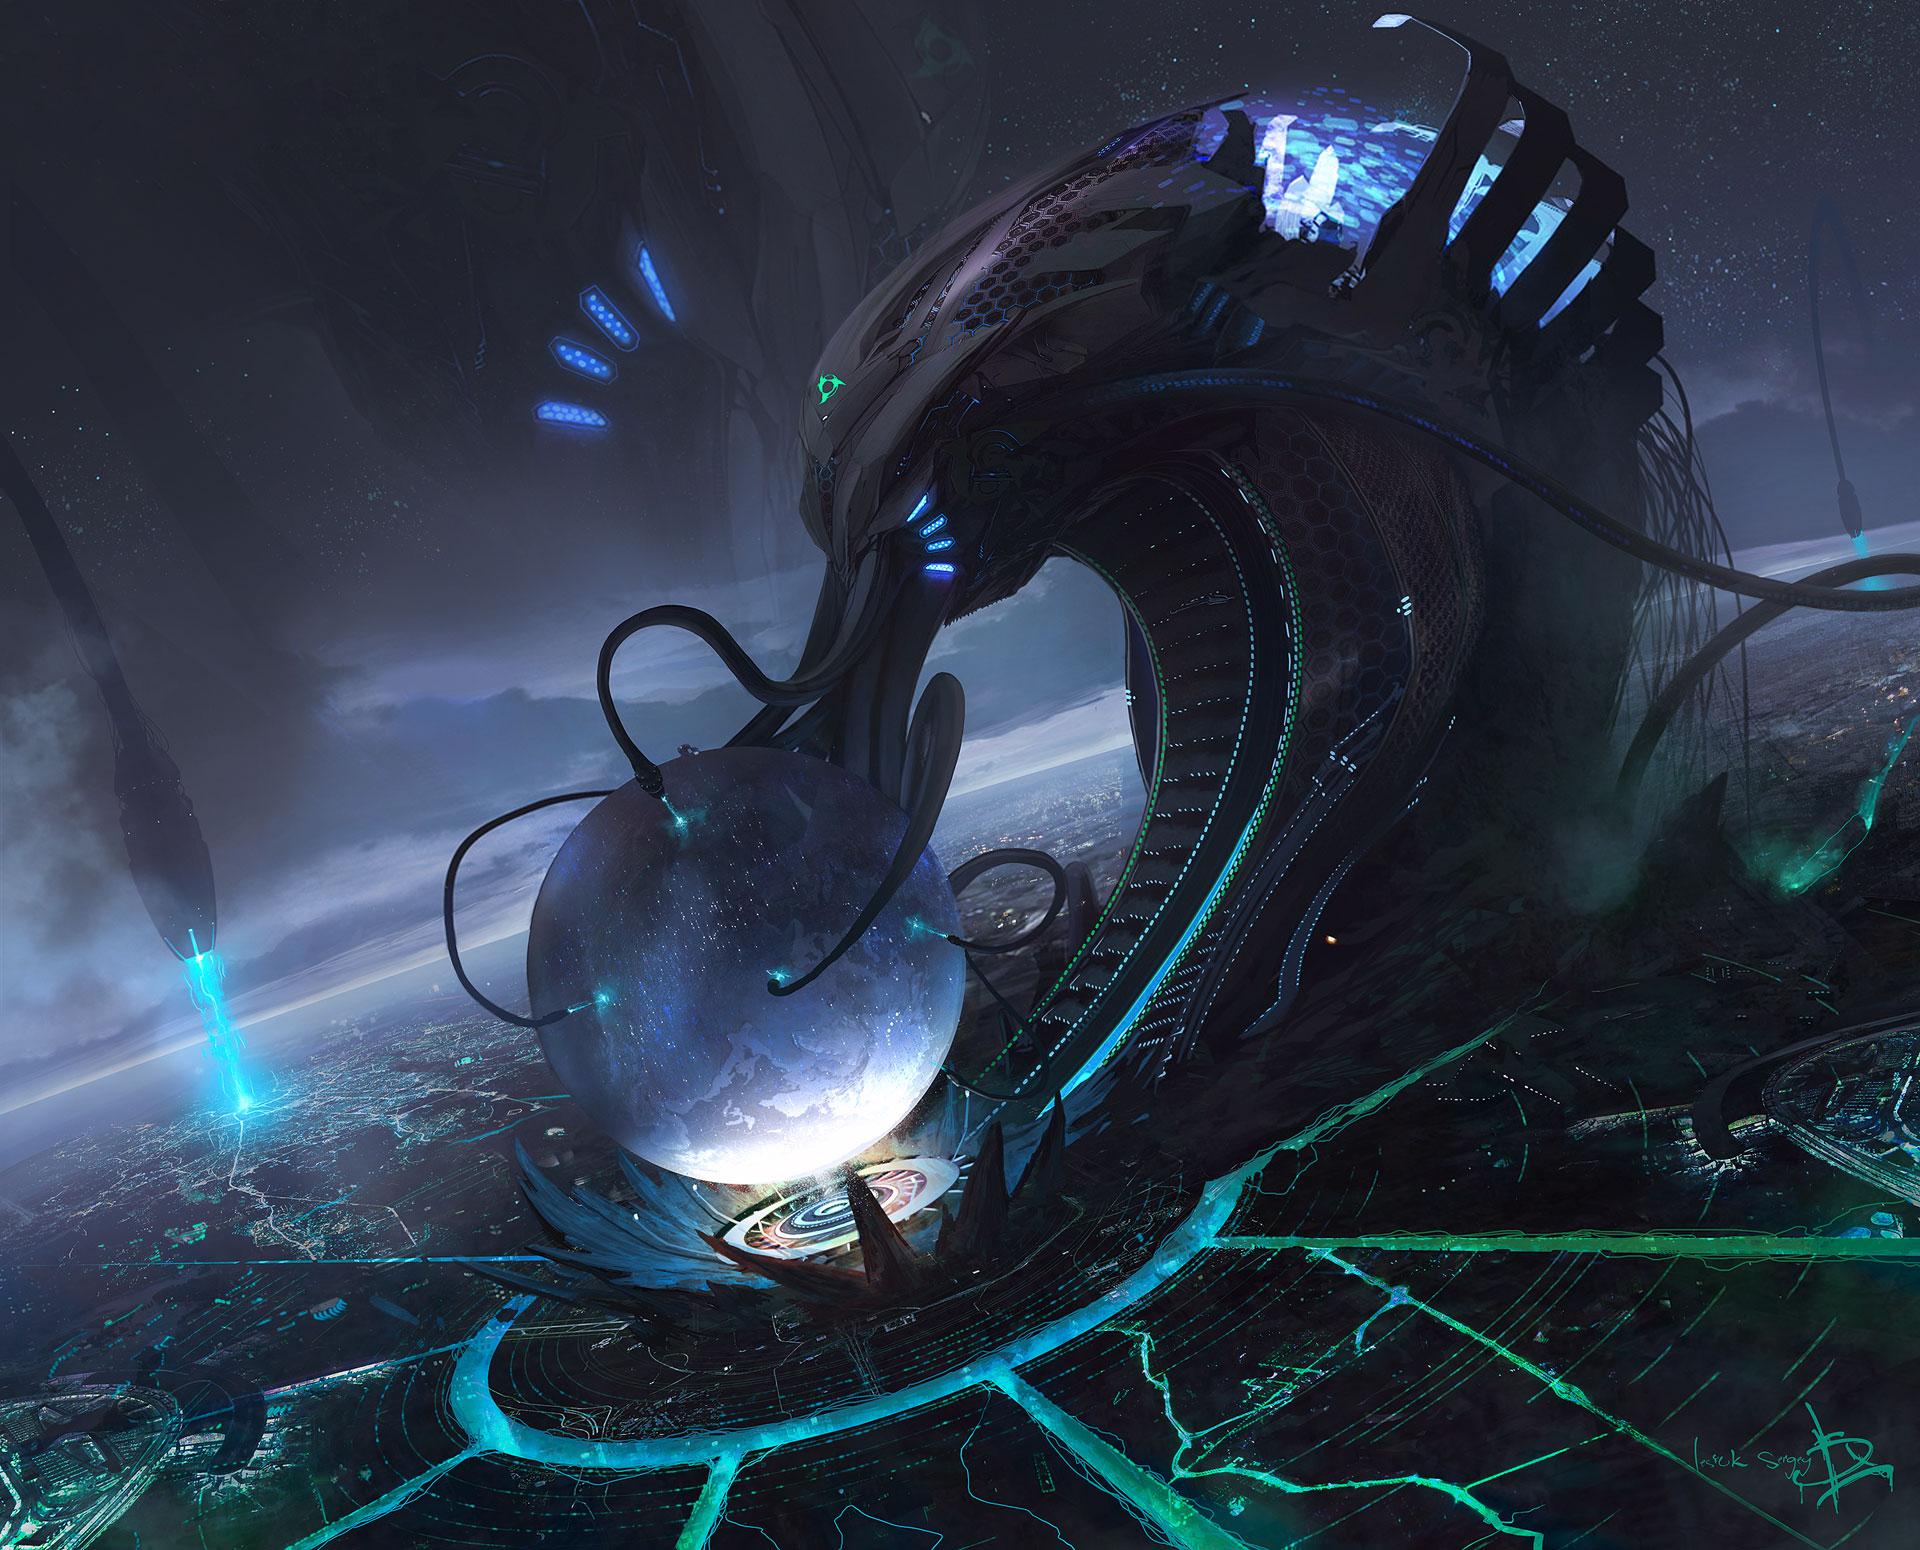 Sci fi Wallpaper of the week 40   Concept art Sci fi 1920x1550